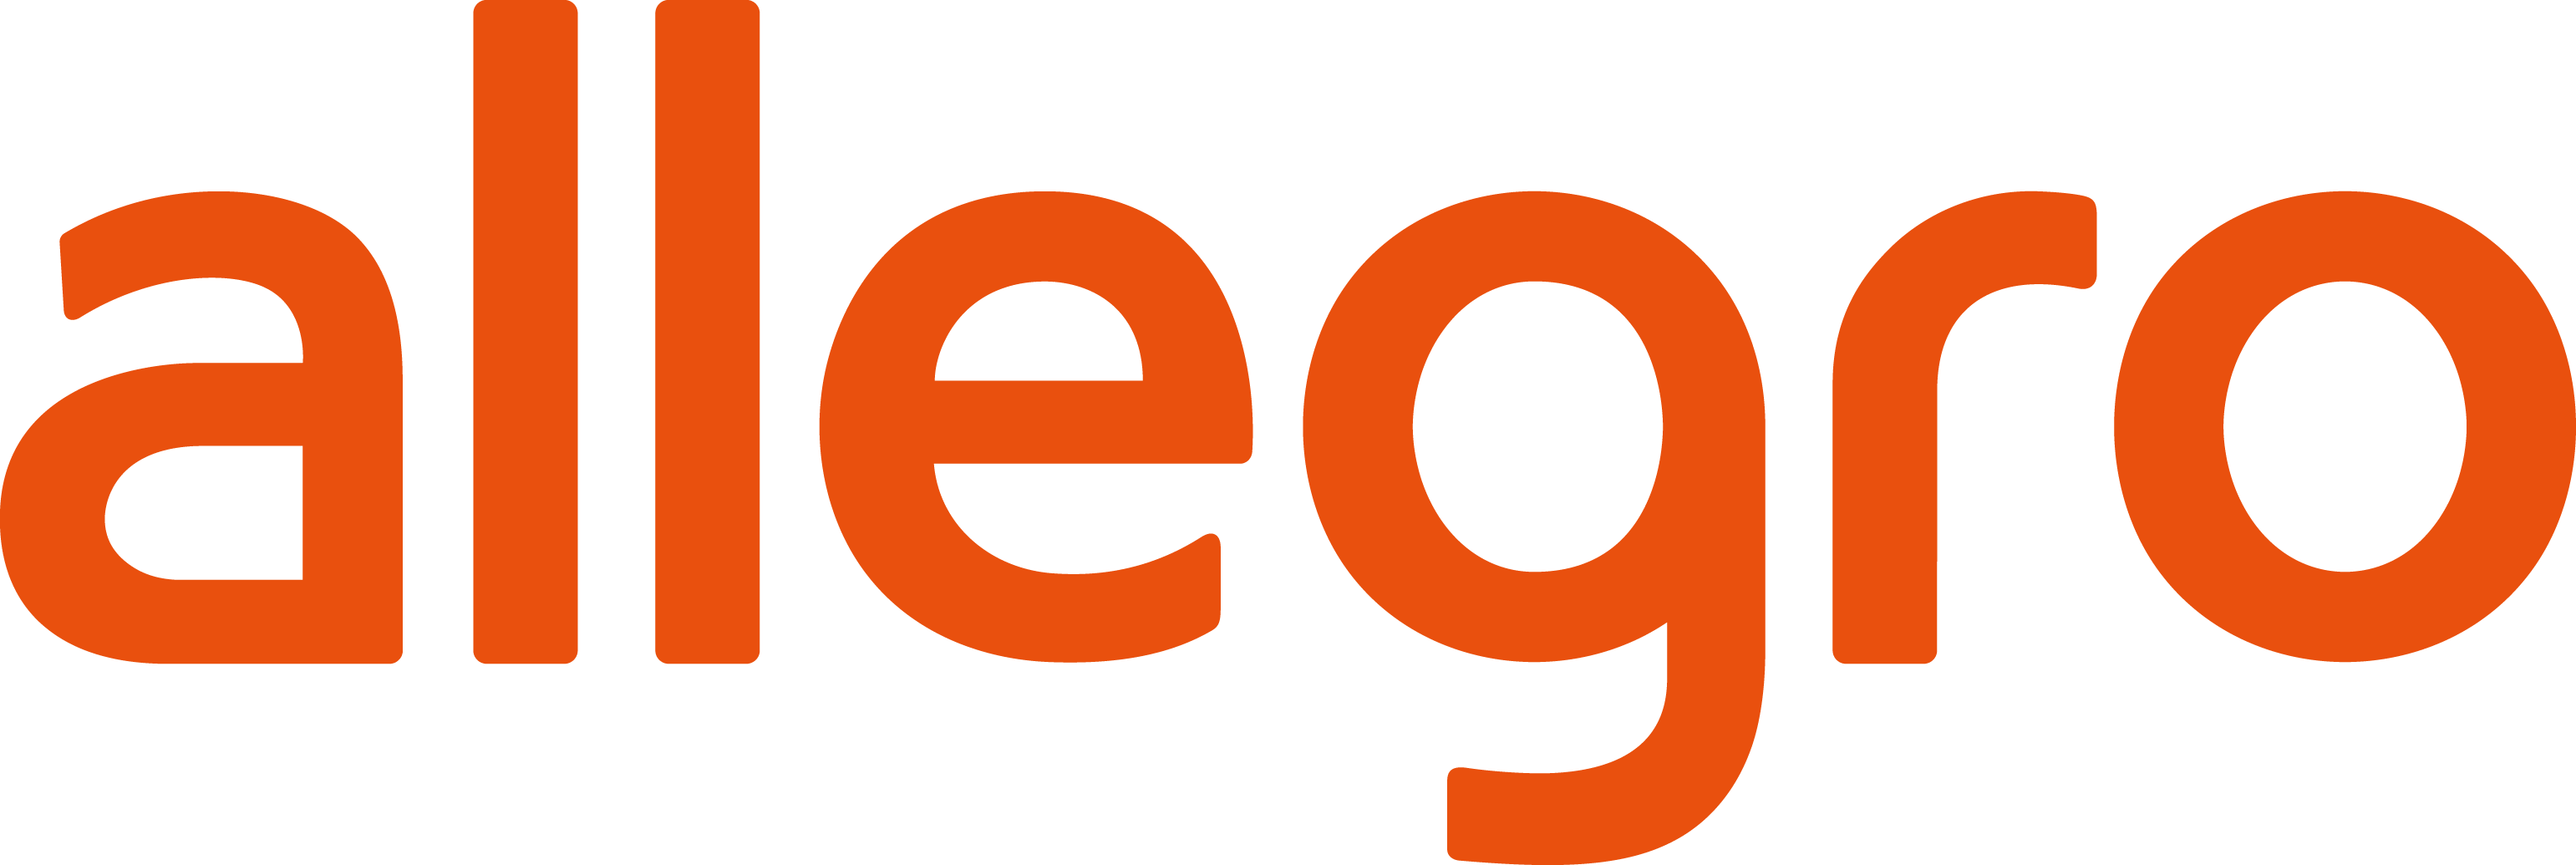 Allegro Logo png